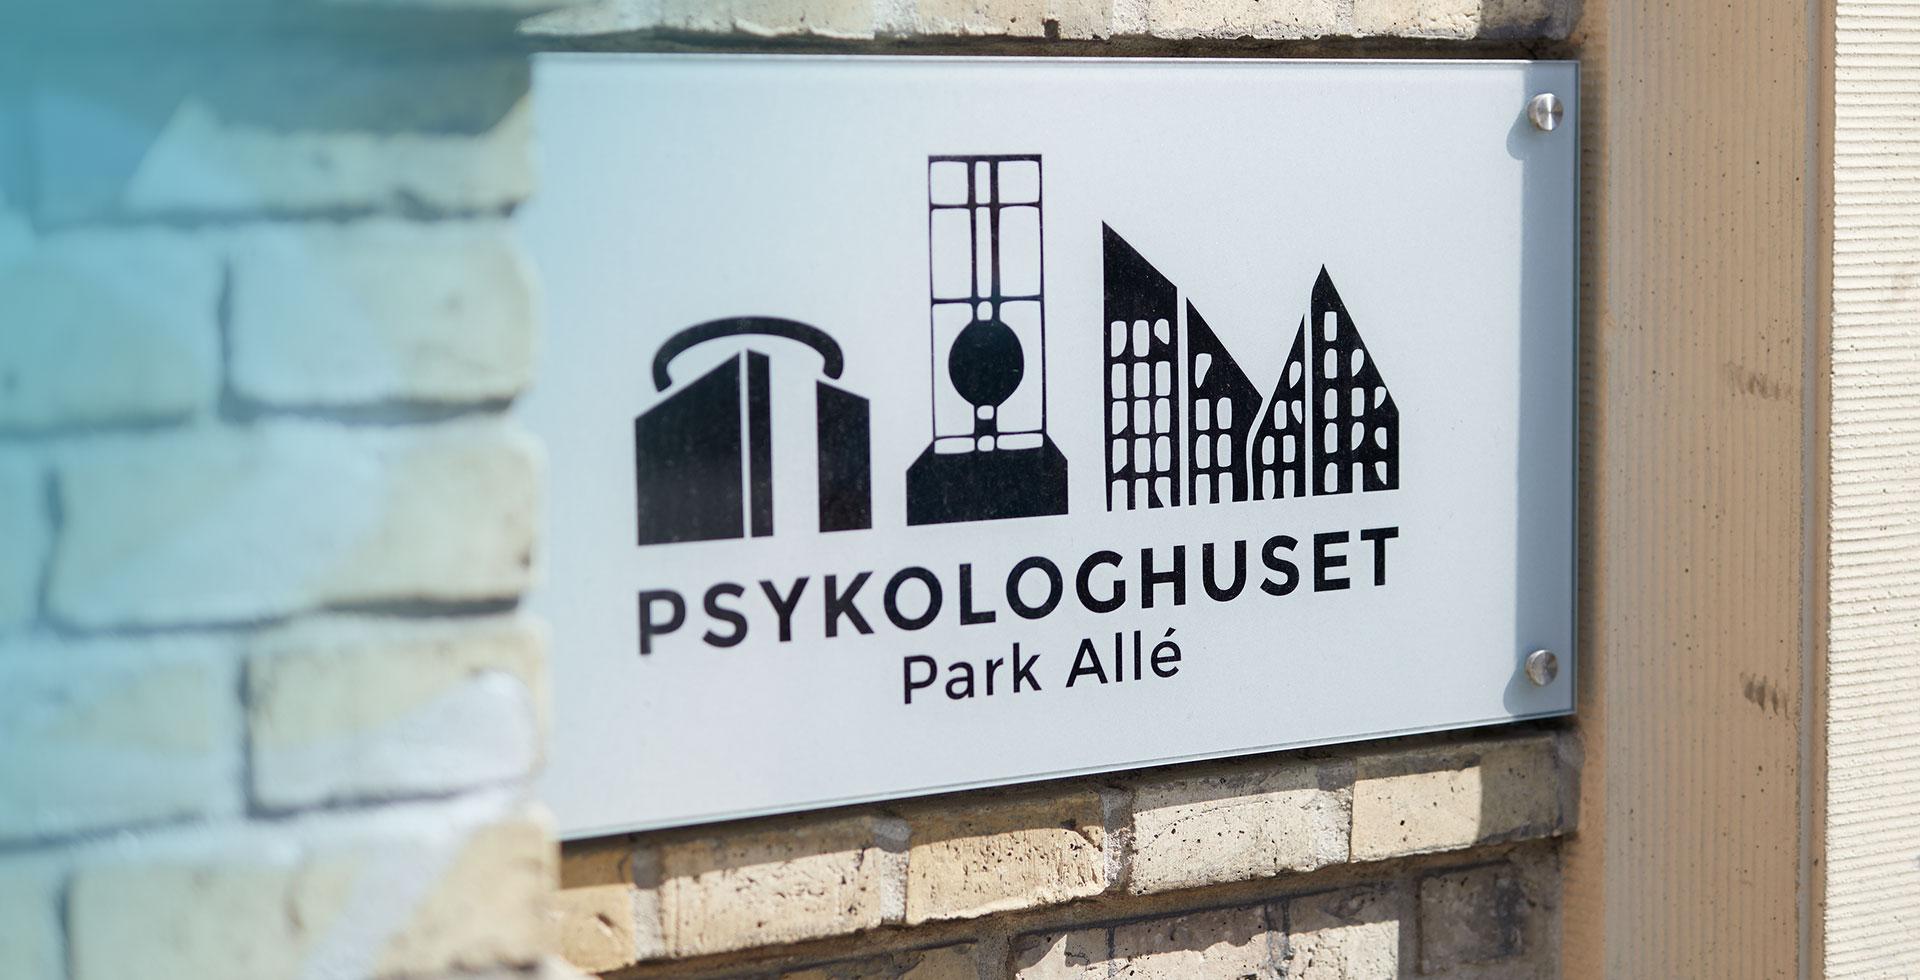 Psykologhuset Park Allé skilt